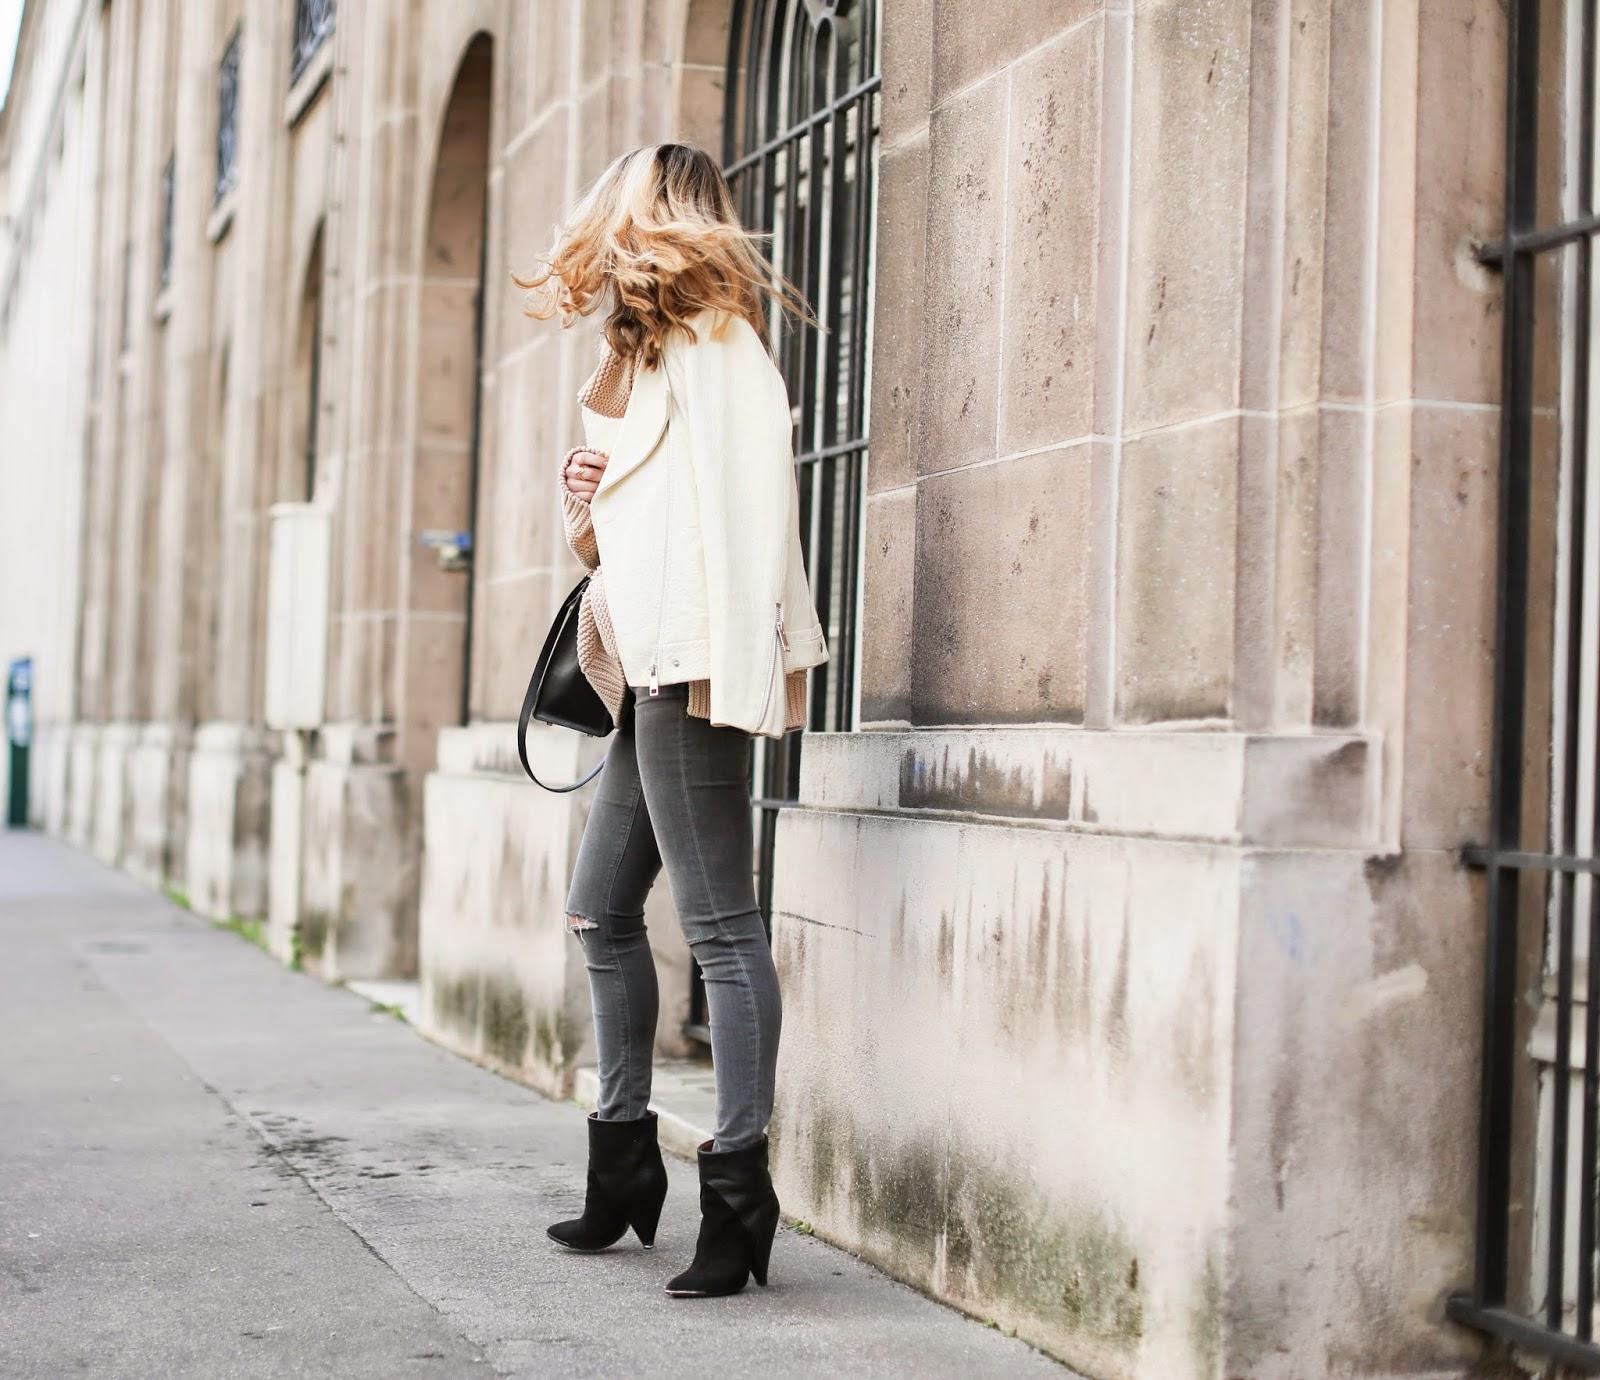 roc eyewear, topshop, zara, nude, iro, hermès, paris, fashion blogger, streetstyle